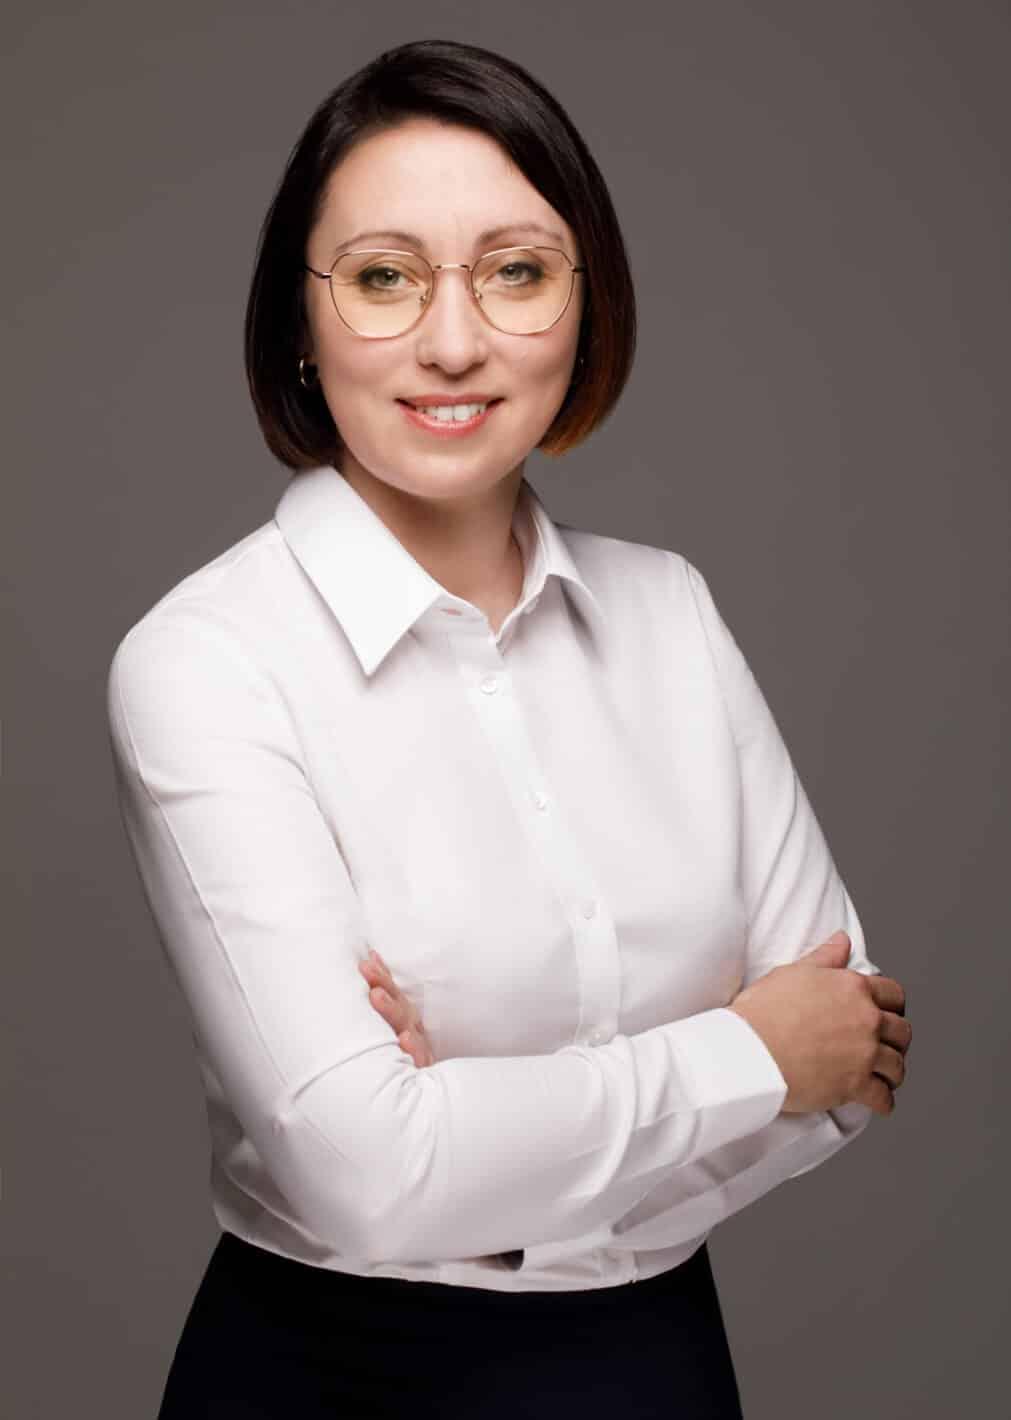 Dorota Szymańska